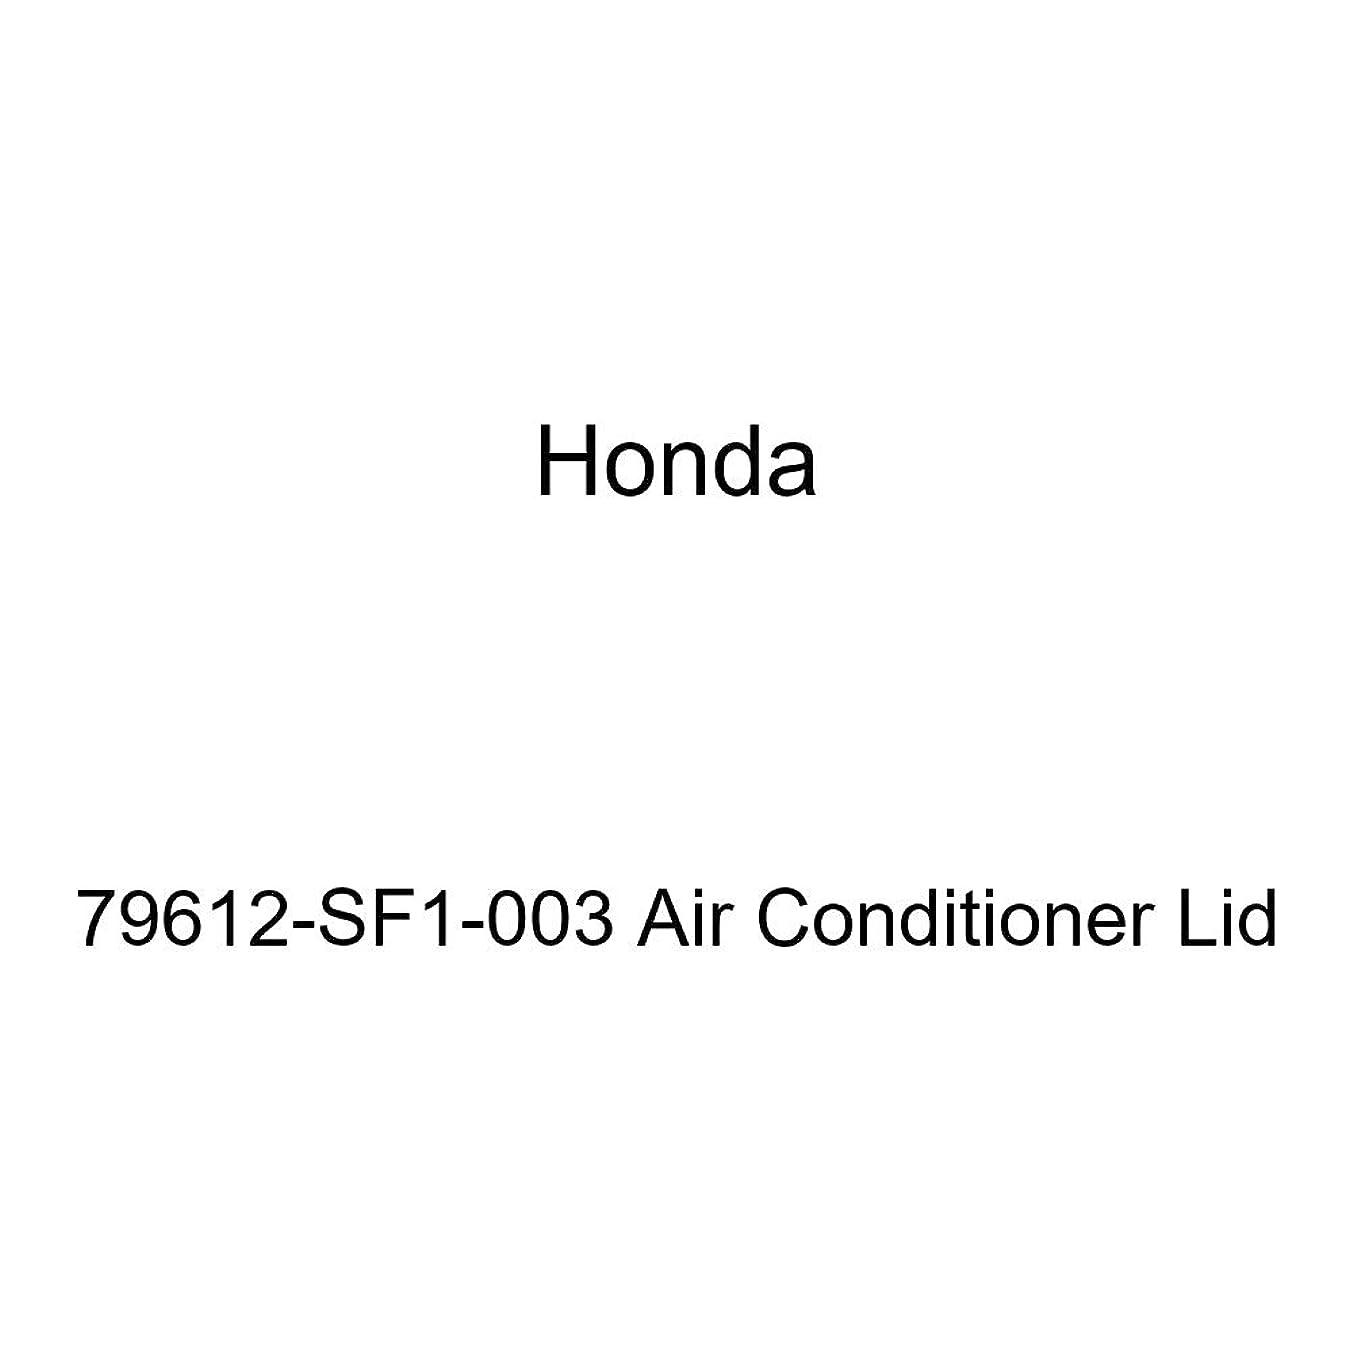 Genuine Honda 79612-SF1-003 Air Conditioner Lid